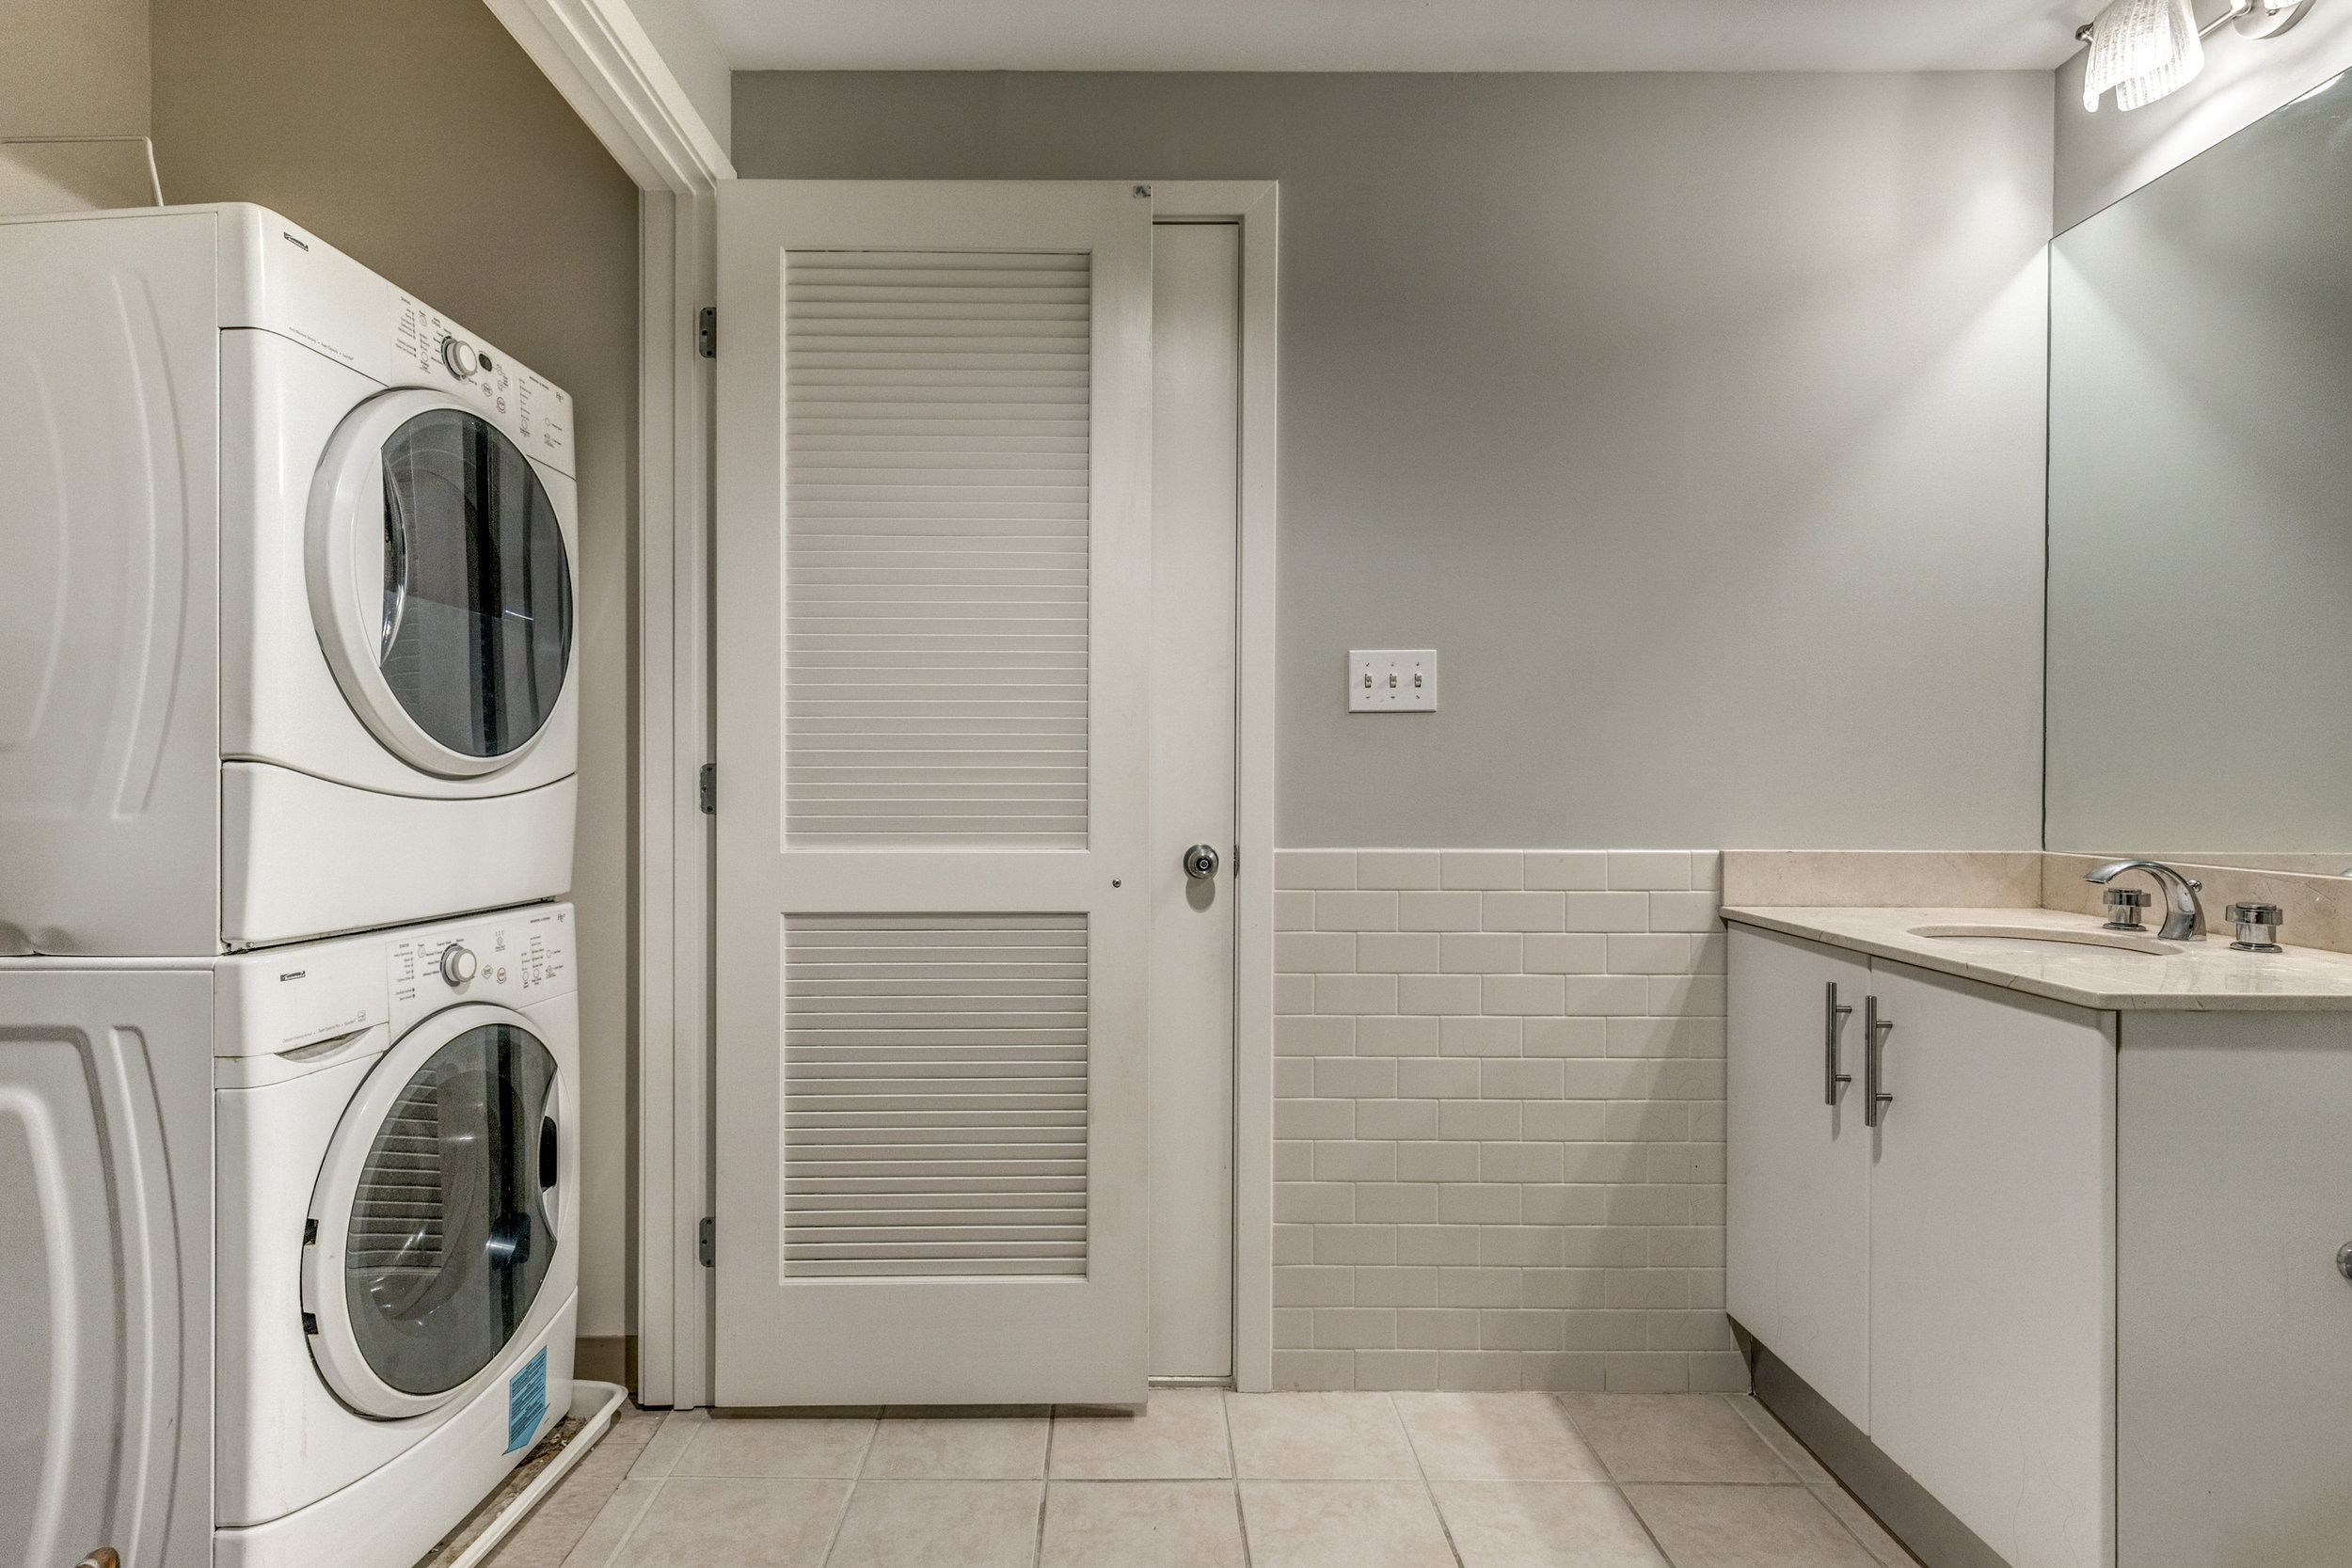 21_Bathroom-5.jpg